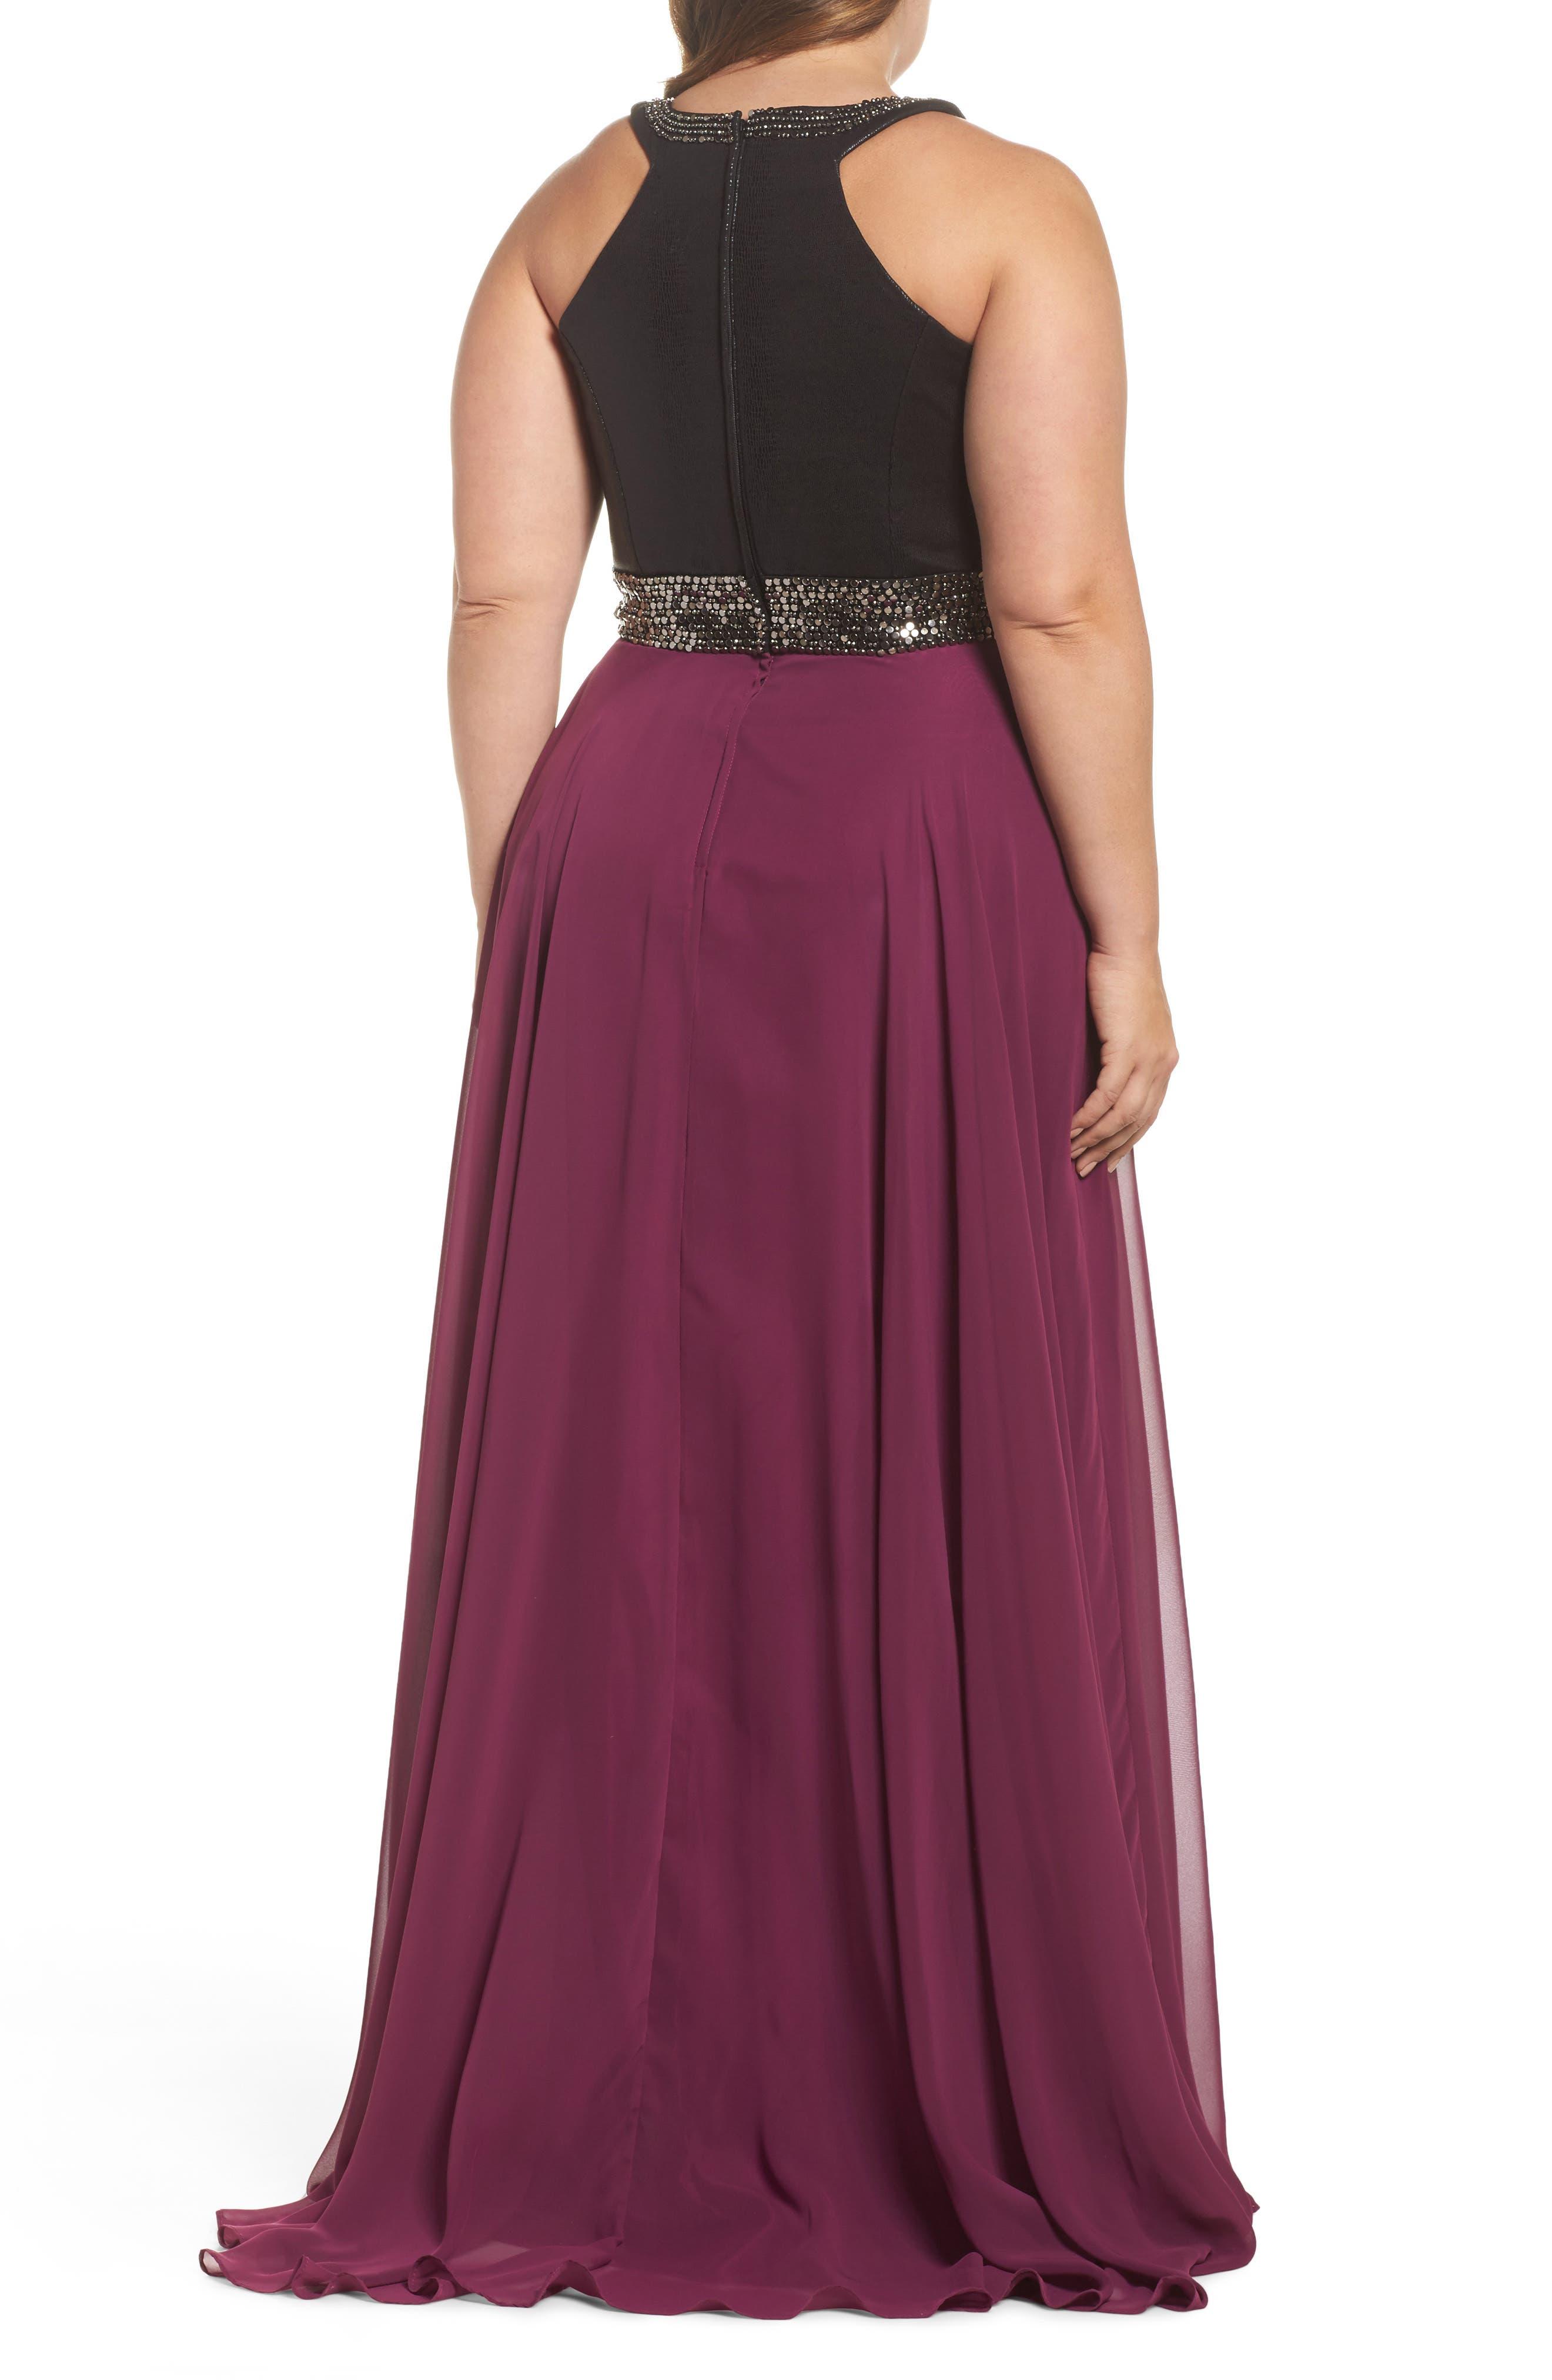 Beaded High Neck Gown,                             Alternate thumbnail 2, color,                             Purple/ Black